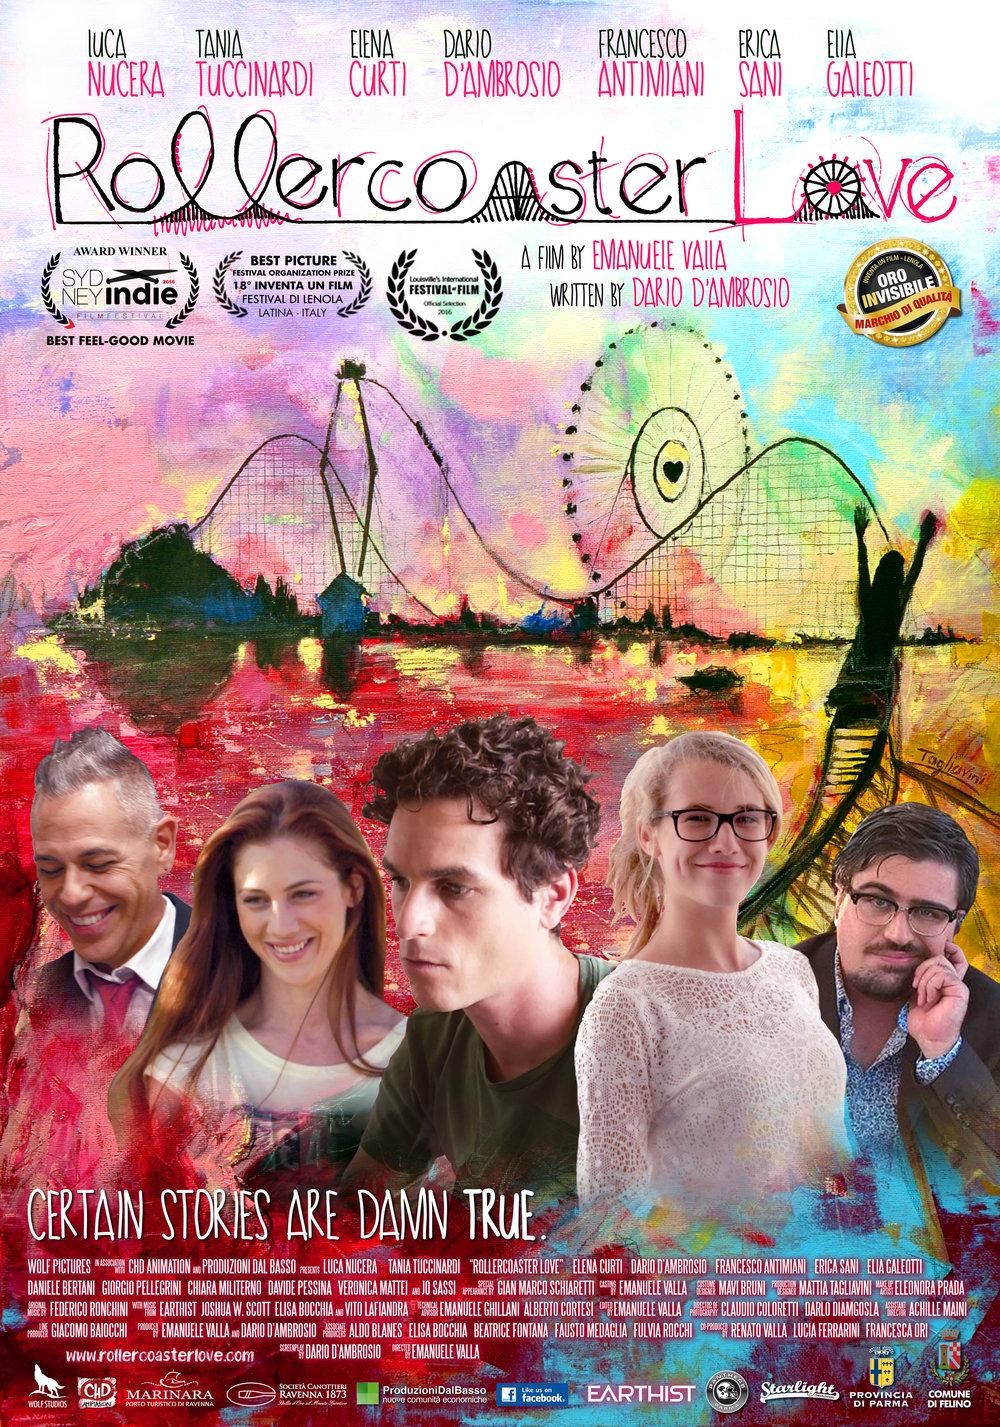 Rollercoaster-Love-International-Poster-2017.jpg